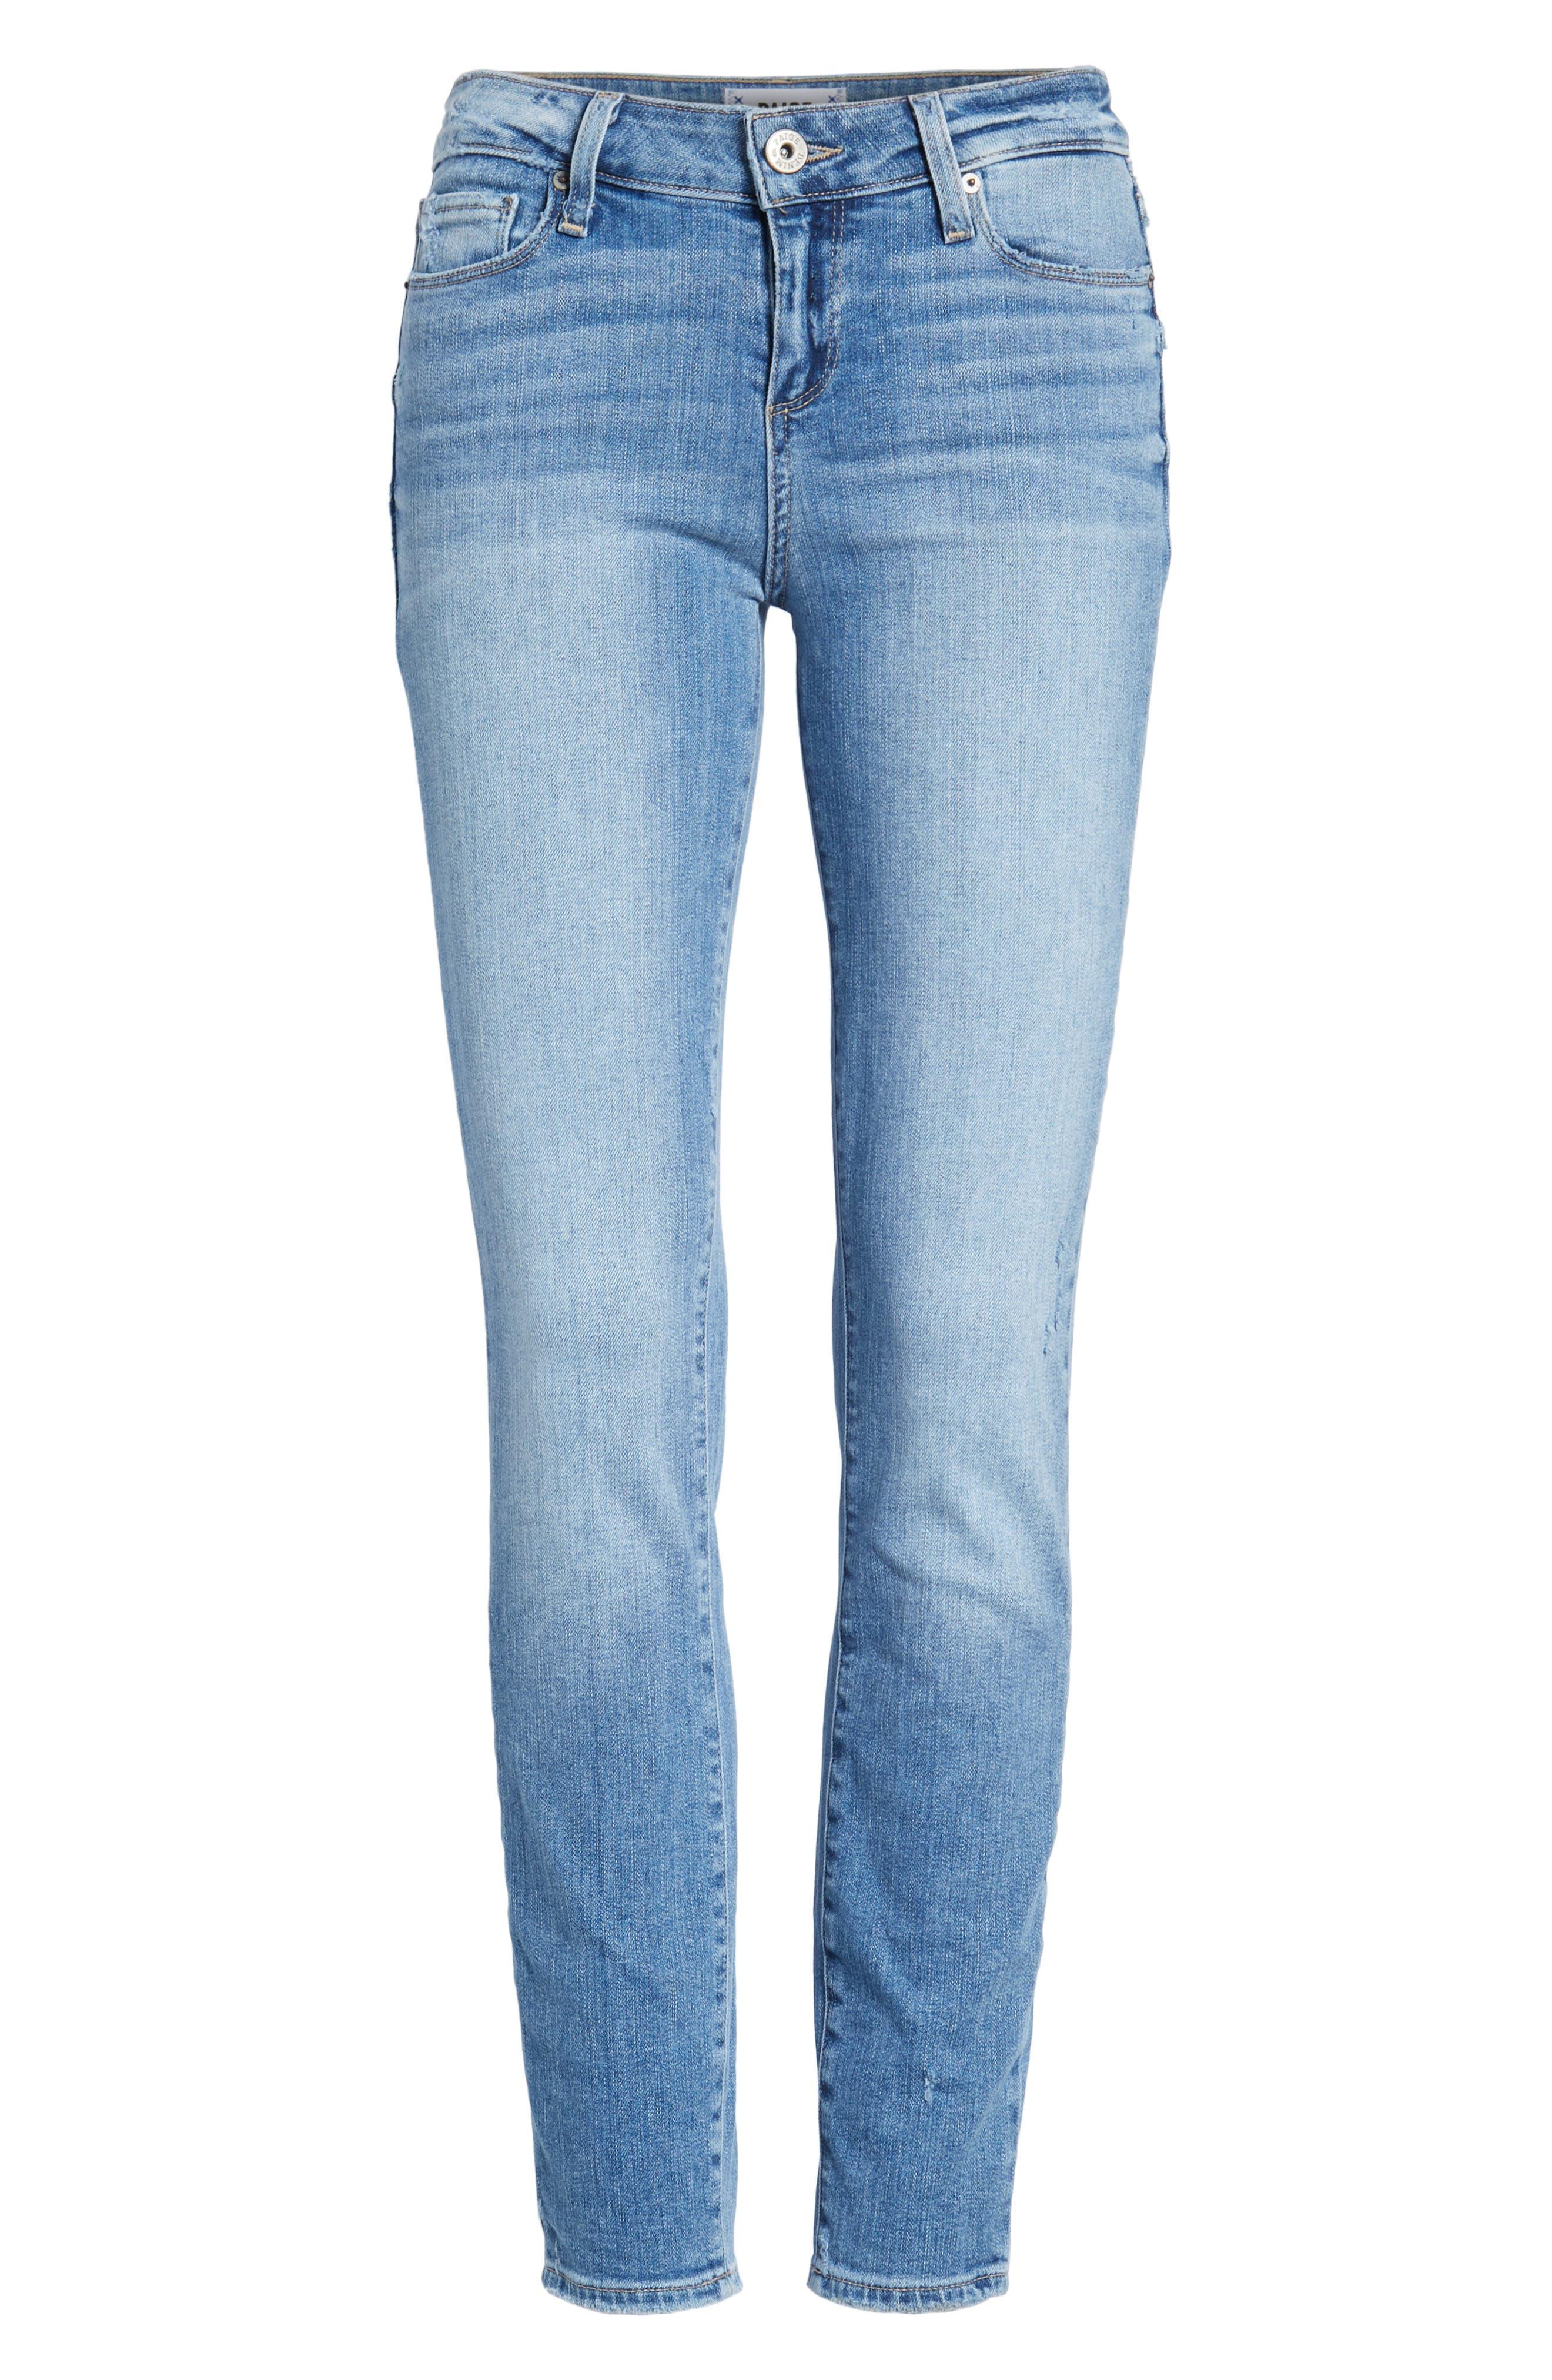 Transcend - Verdugo Ankle Ultra Skinny Jeans,                             Alternate thumbnail 6, color,                             400